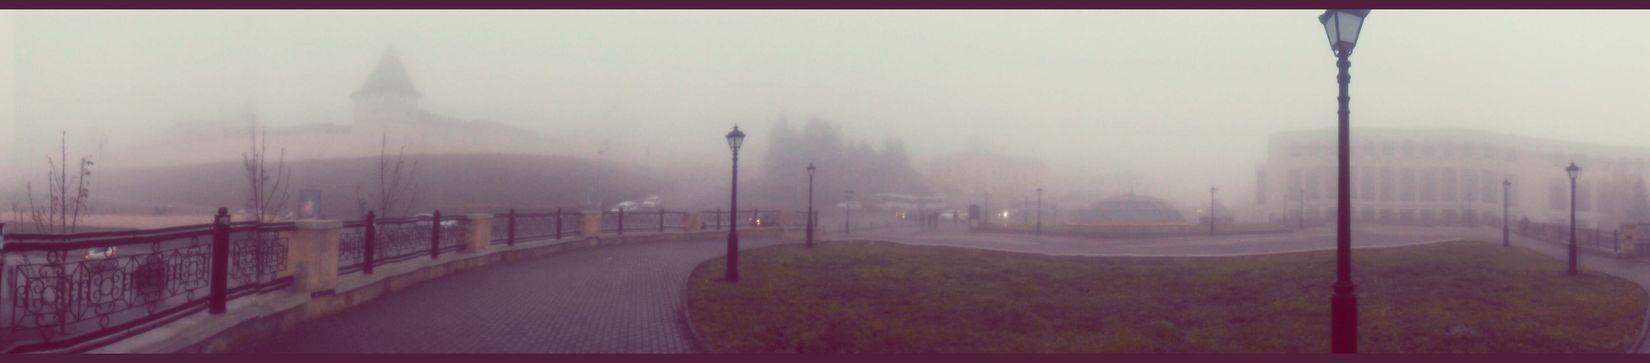 Silent Hill Hello World